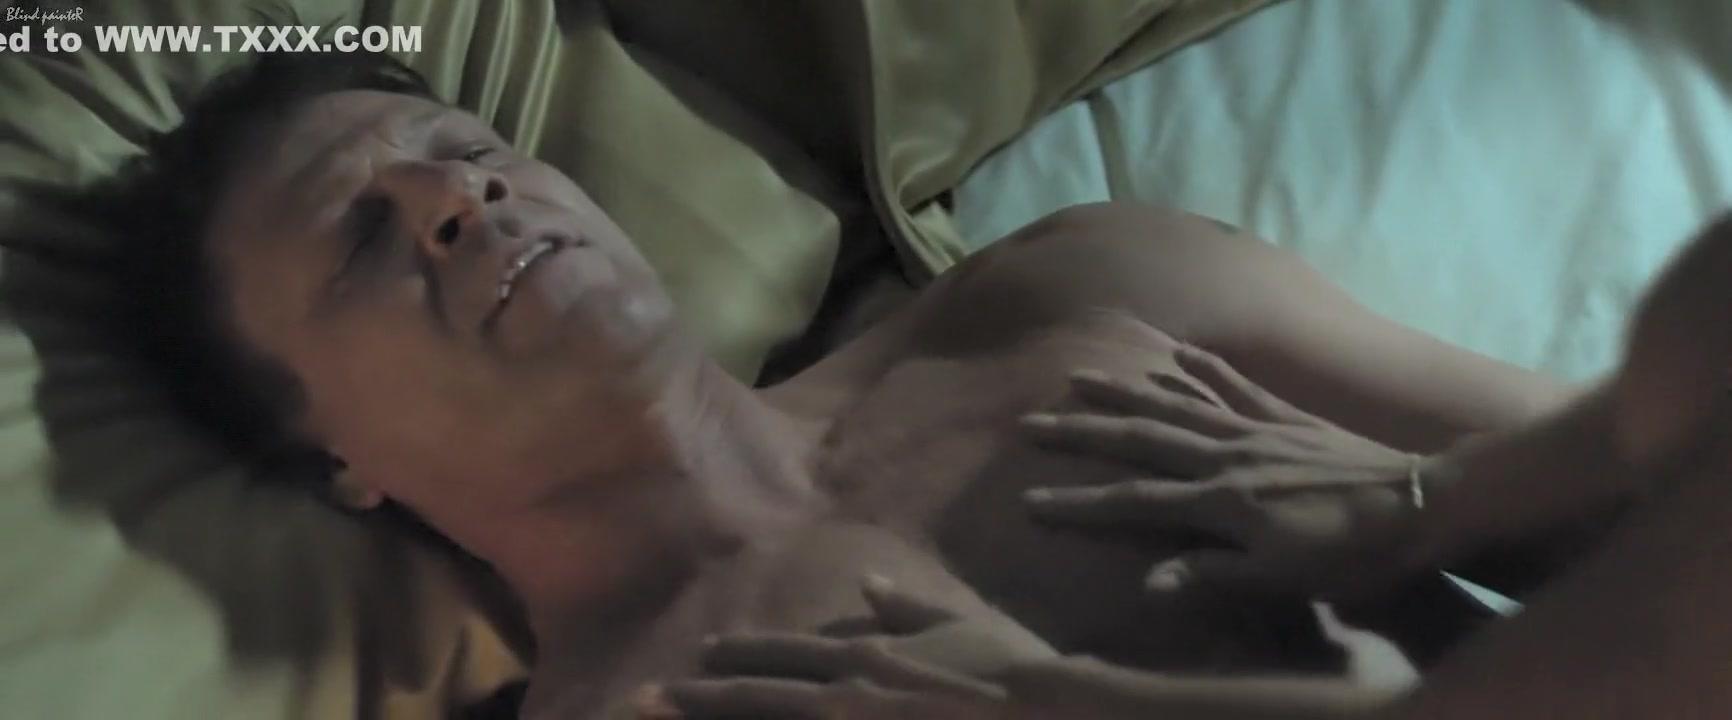 XXX Porn tube Sexy crempie